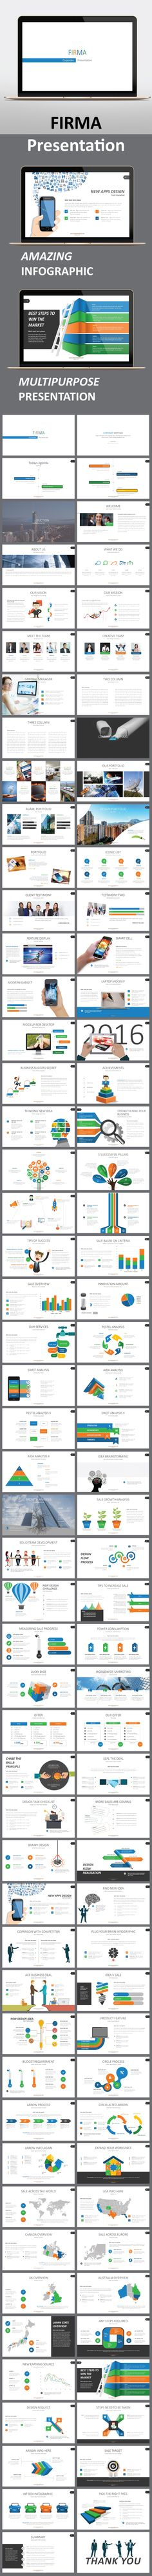 Firma PowerPoint Presentation Template. Download here: http://graphicriver.net/item/firma-presentation-template/15629405?ref=ksioks